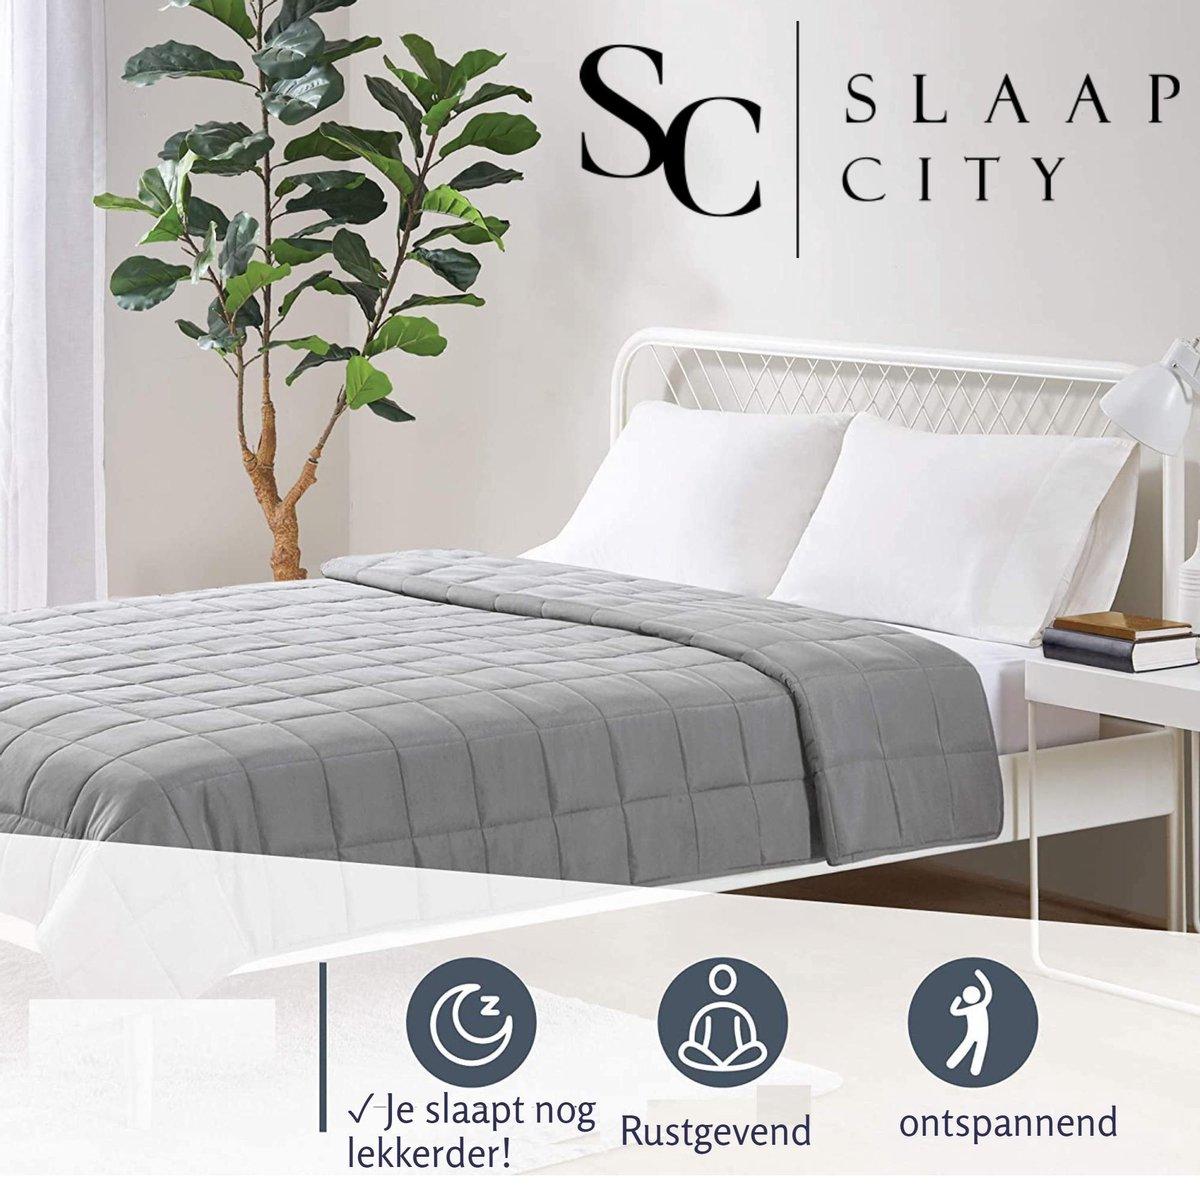 Slaapcity  Verzwaringsdeken 7 KG - Weighted Blanket - Verzwaarde Deken - Autisme - Anti Stress